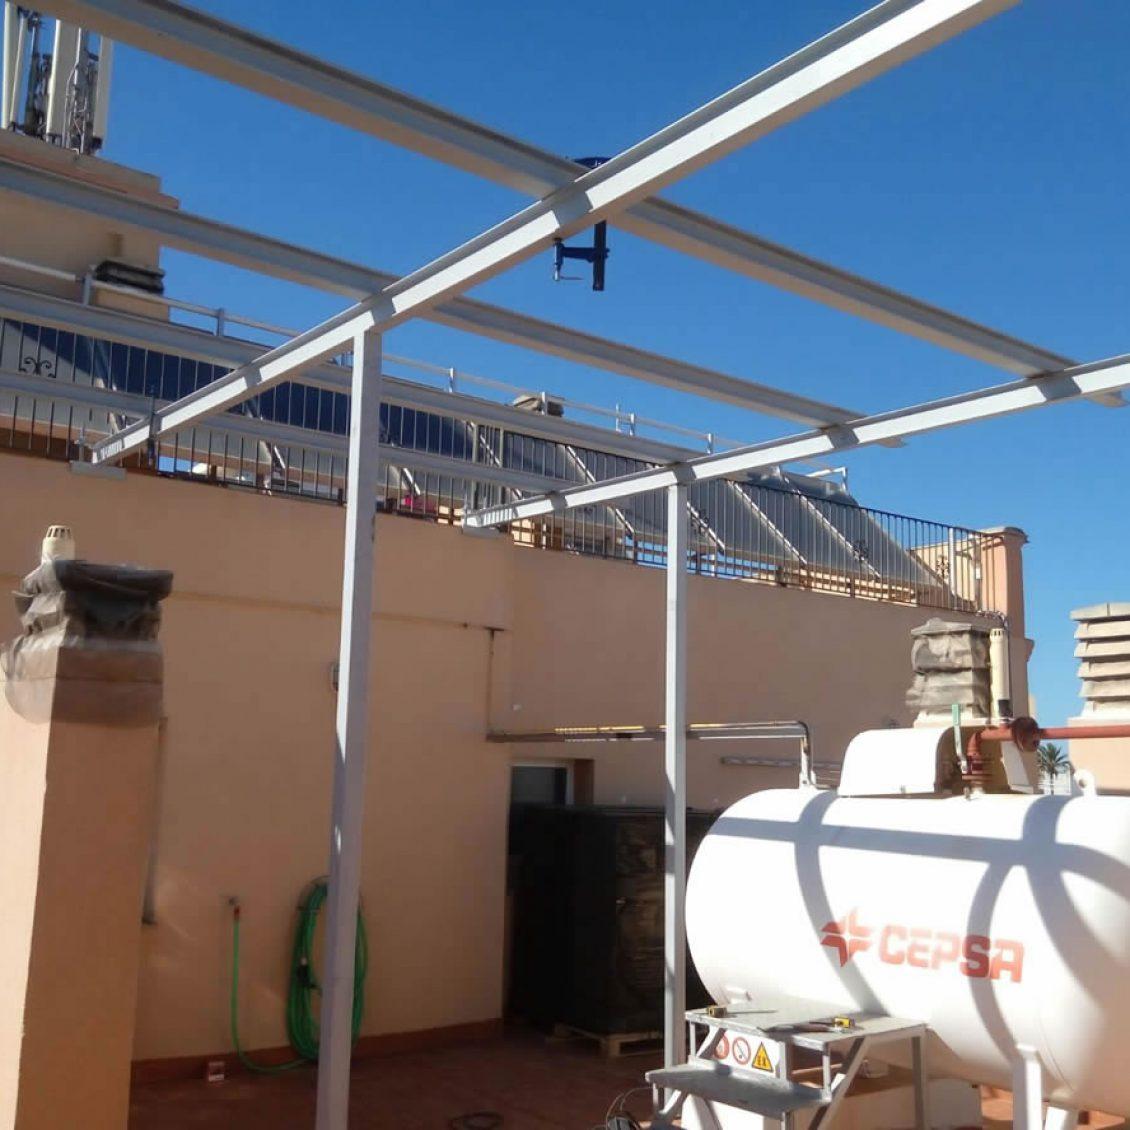 estructura-metalica-para-huerto-solar-La-Ribera